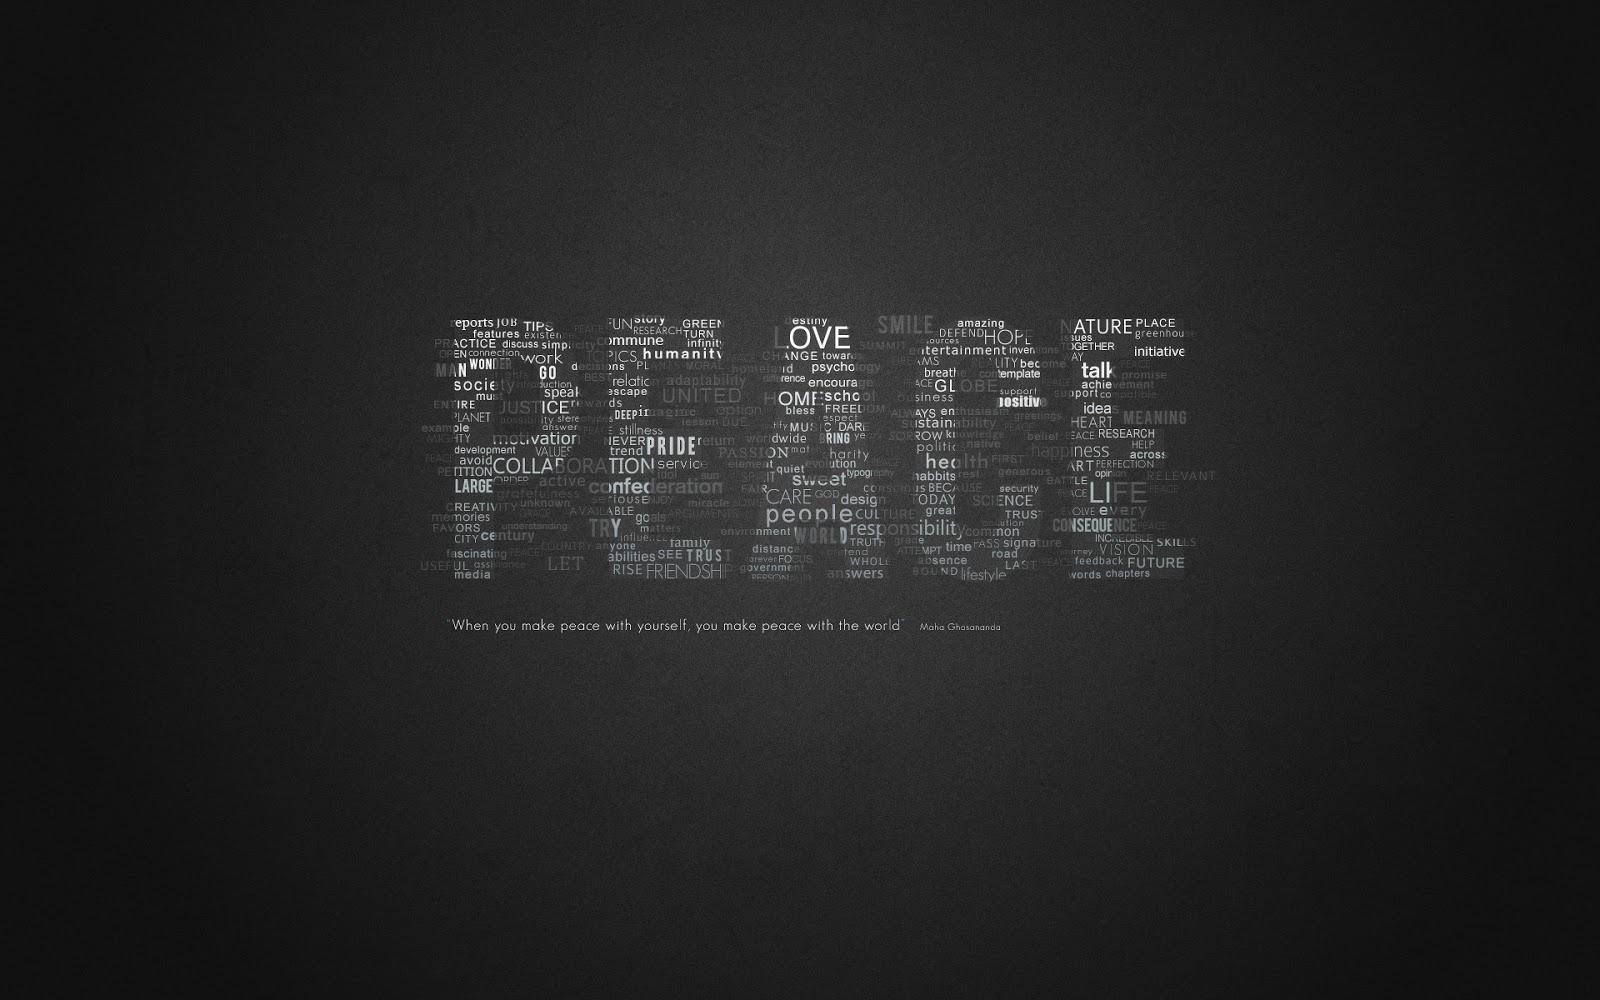 Peace hd wallpaper peace wallpaper Amazing Wallpapers 1600x1000